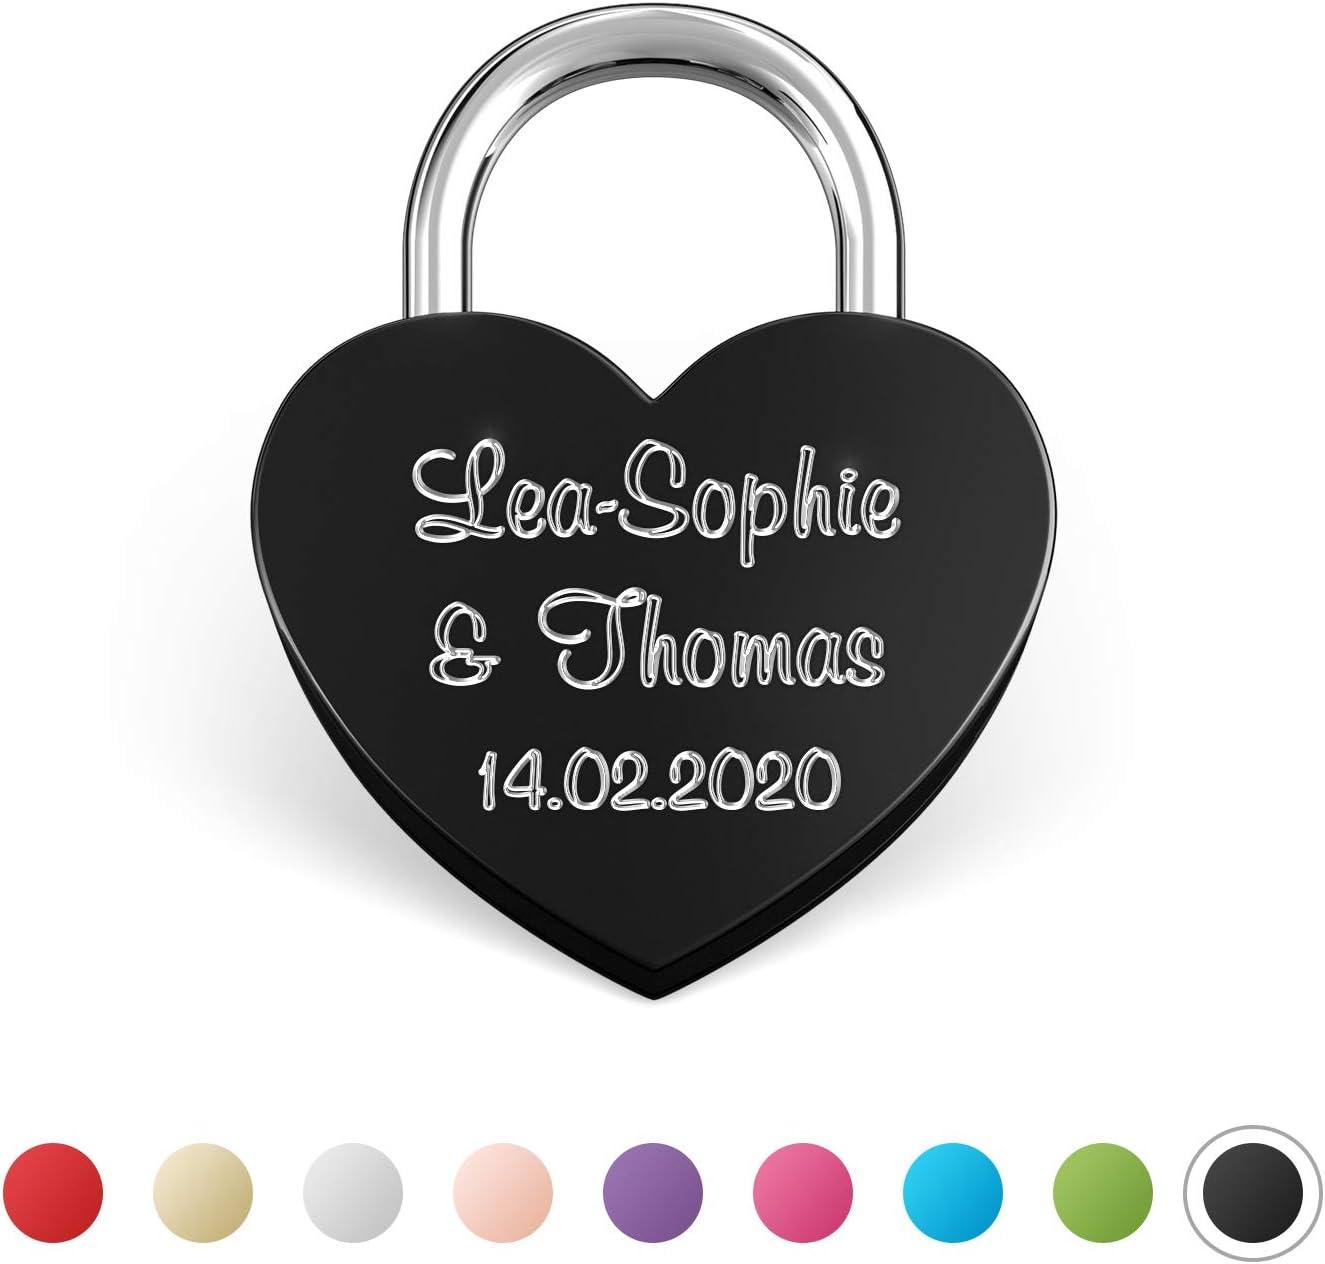 Personalised Engraved Black Square Large Padlock Love Lock /& Organza Bag